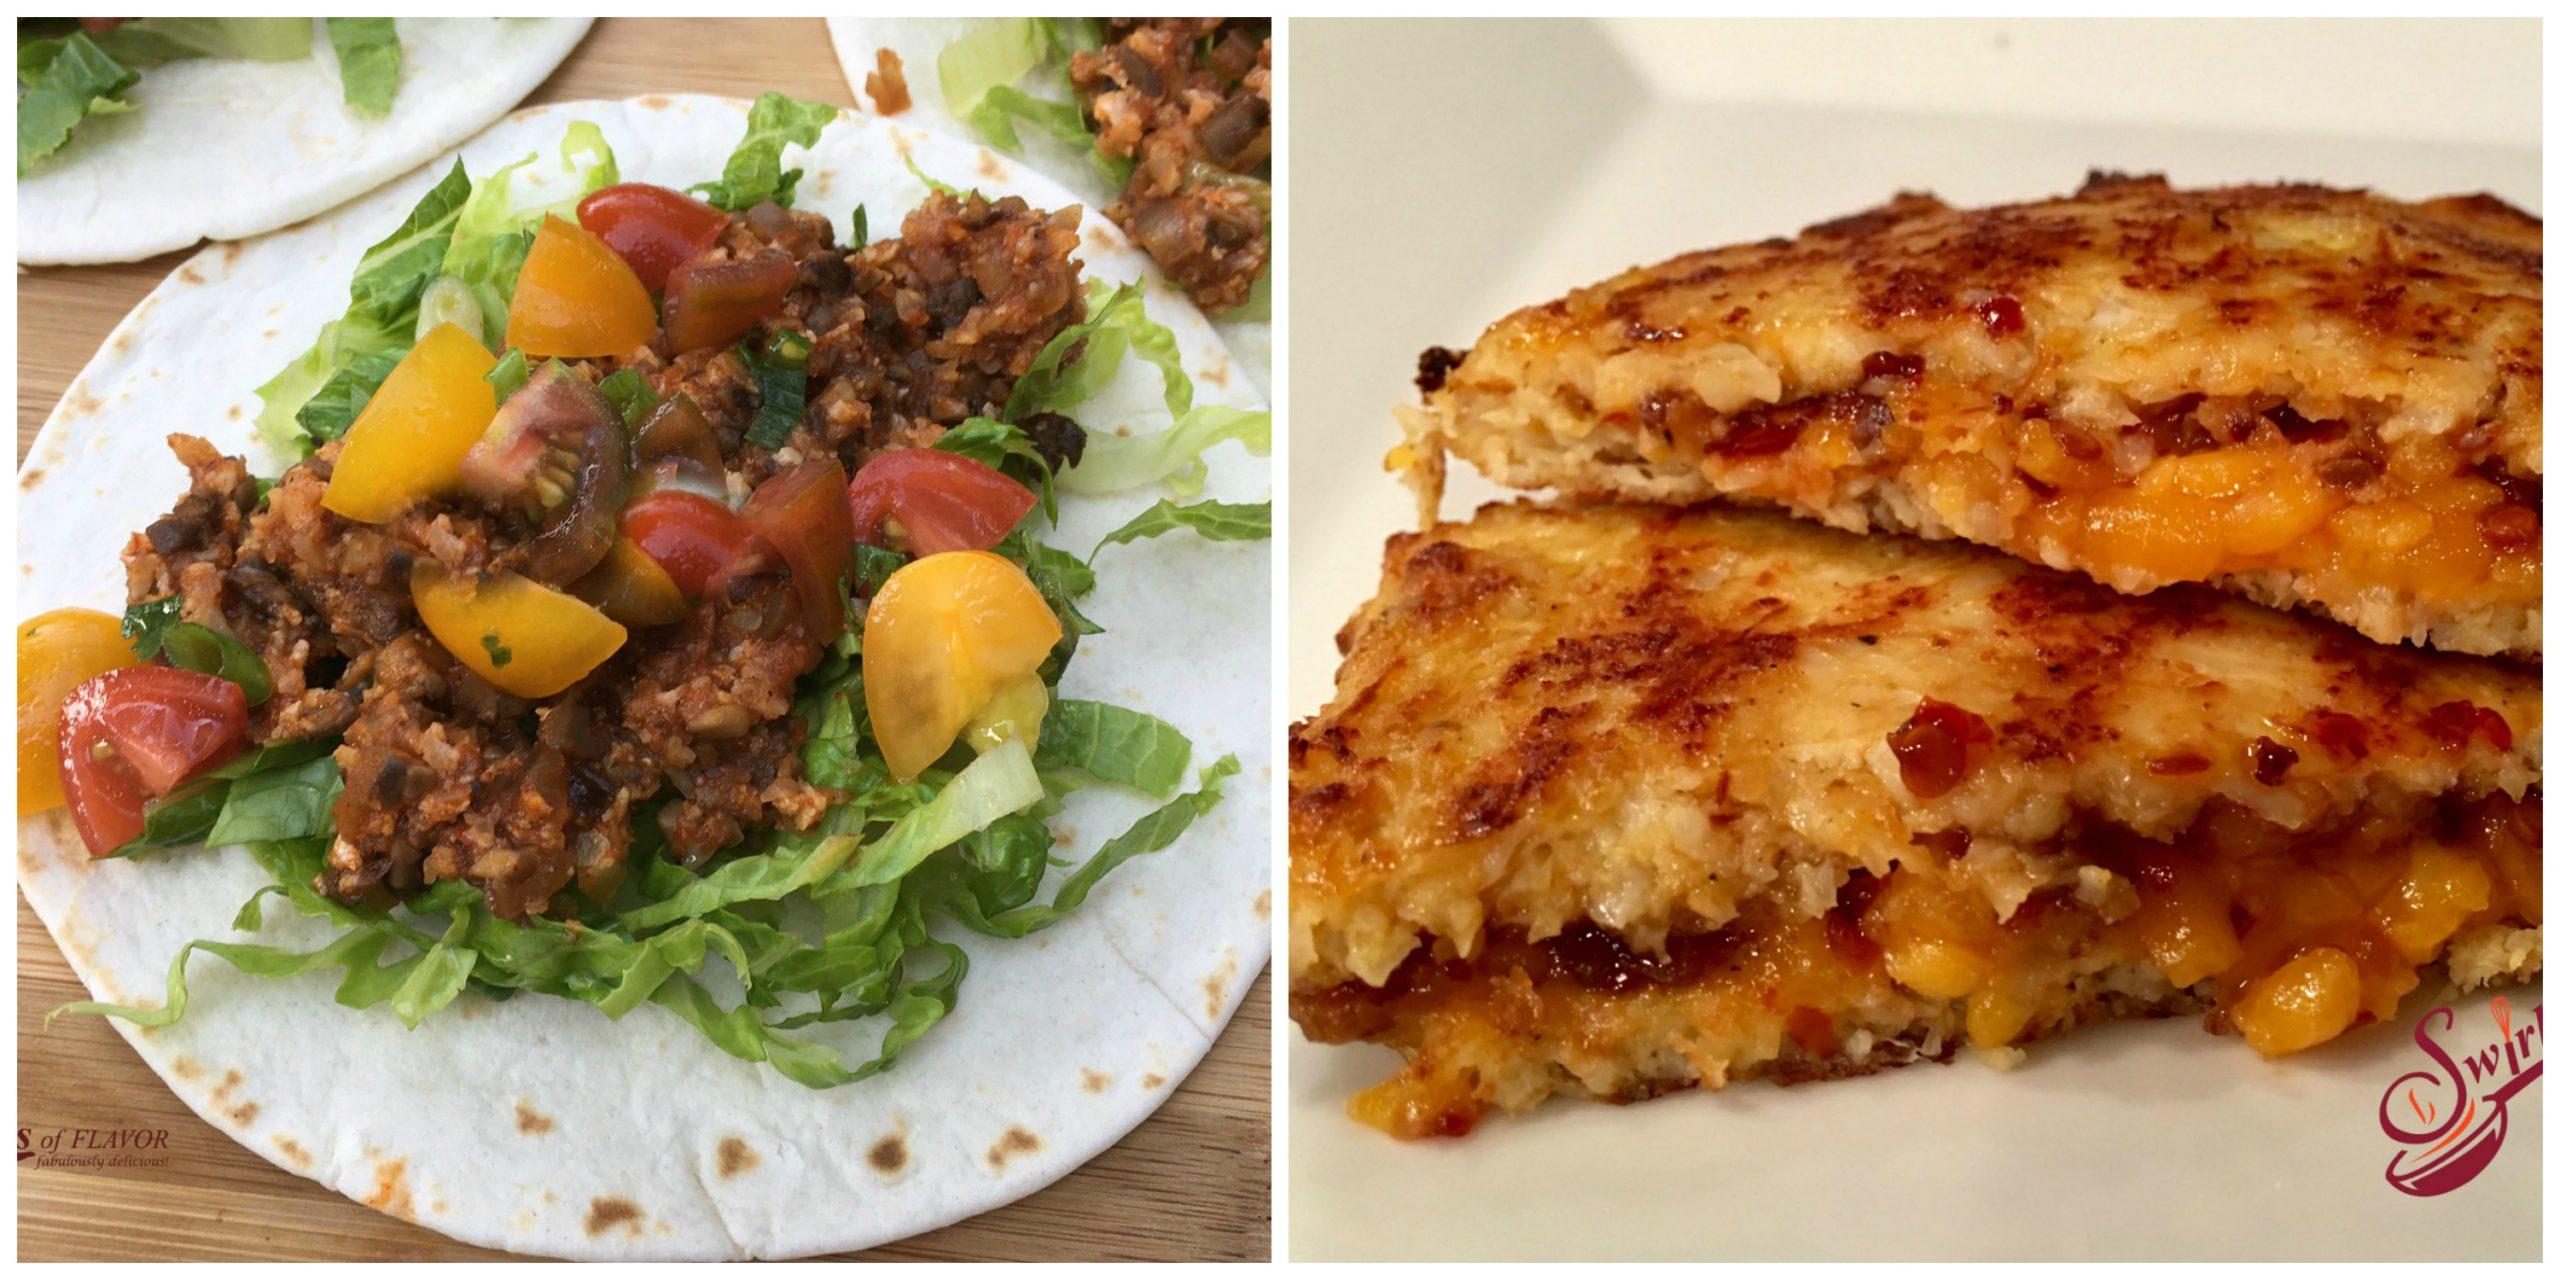 Cauliflower Tacos and Cauliflower Grilled Cheese